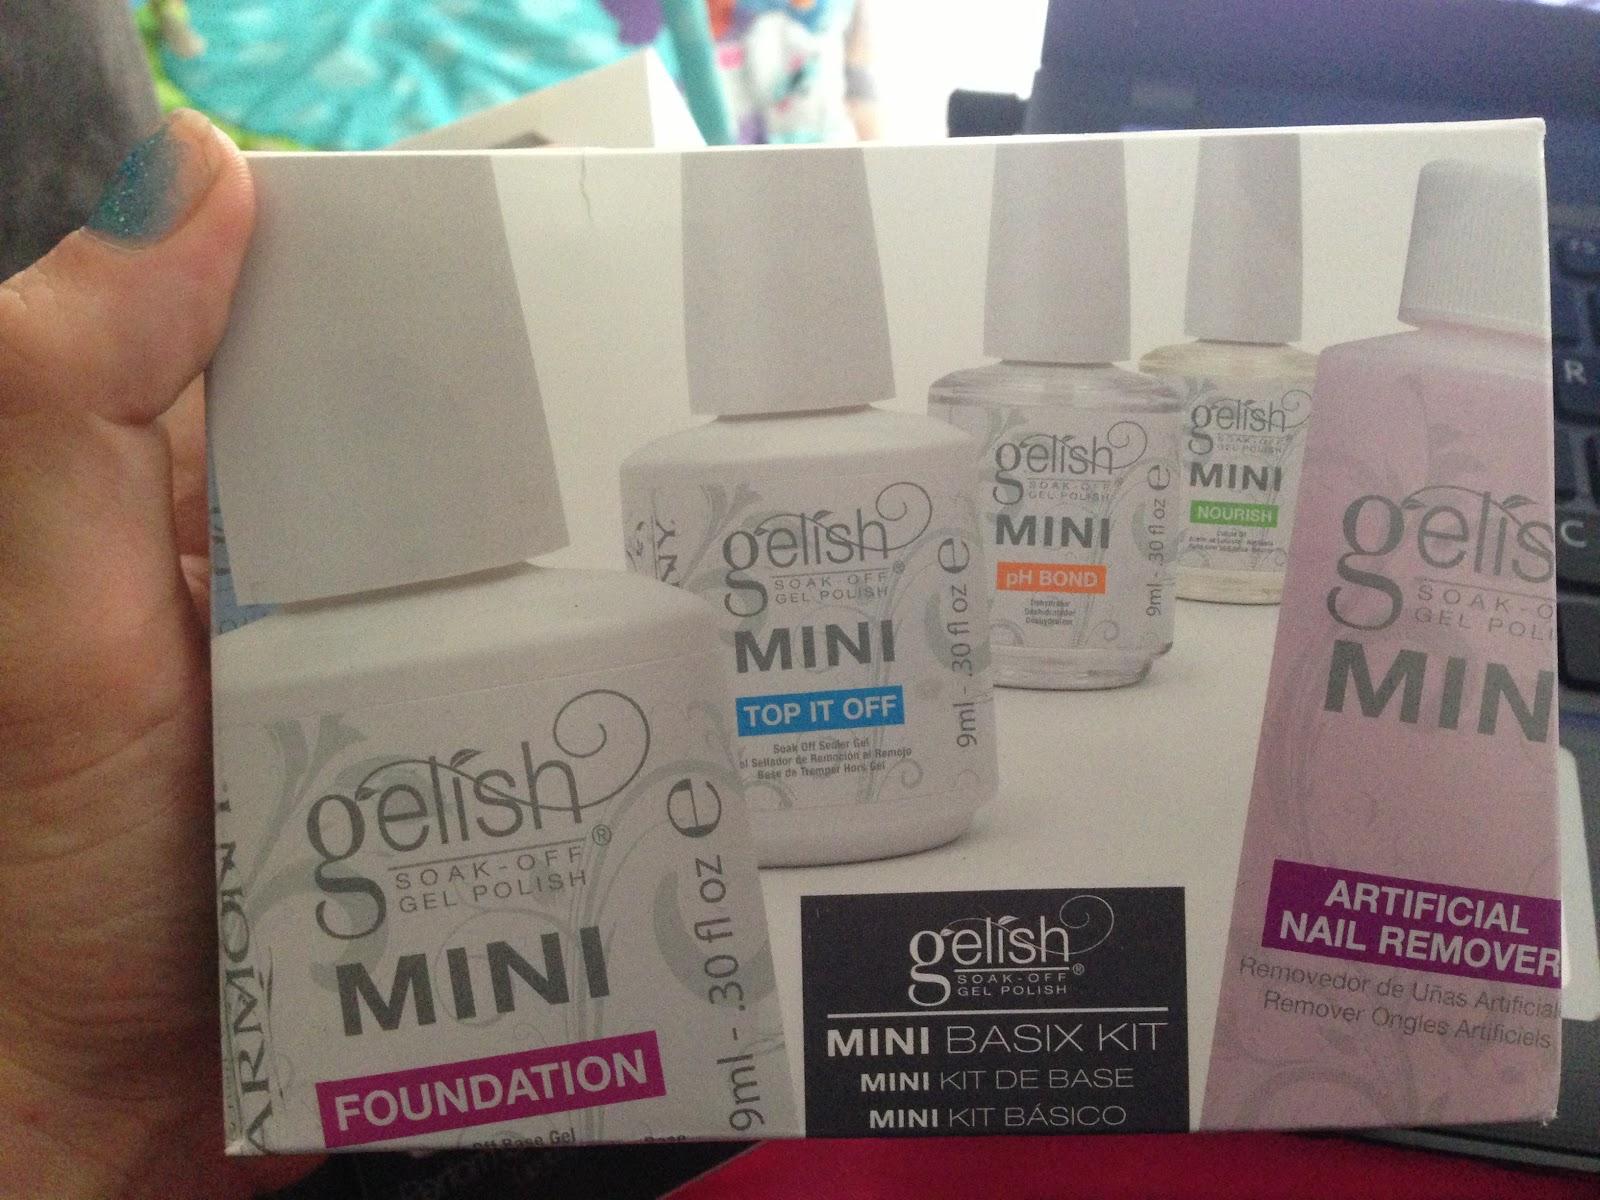 The Science of Beauty: Gelish soak off gel polish